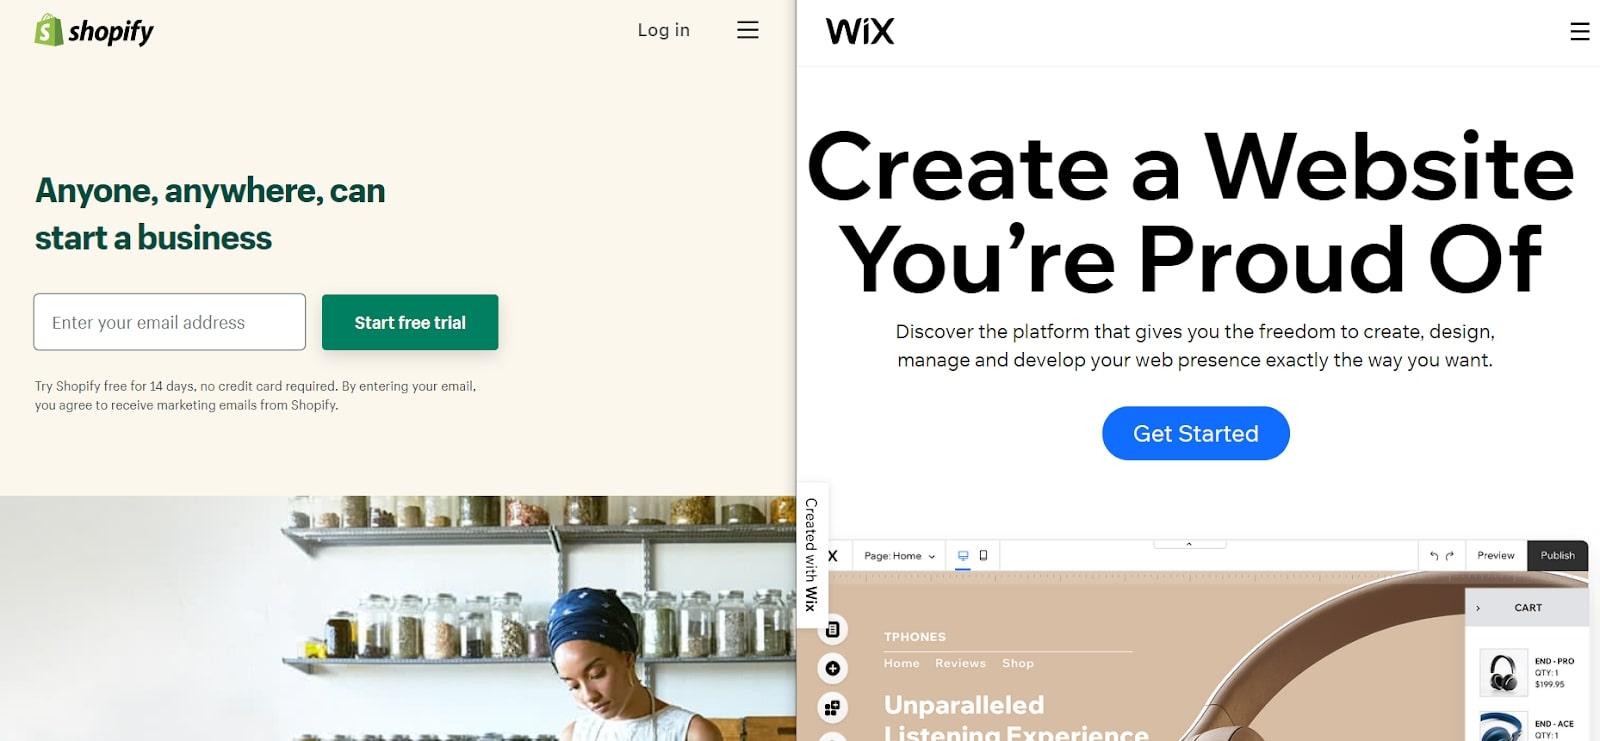 Wix contre Shopify